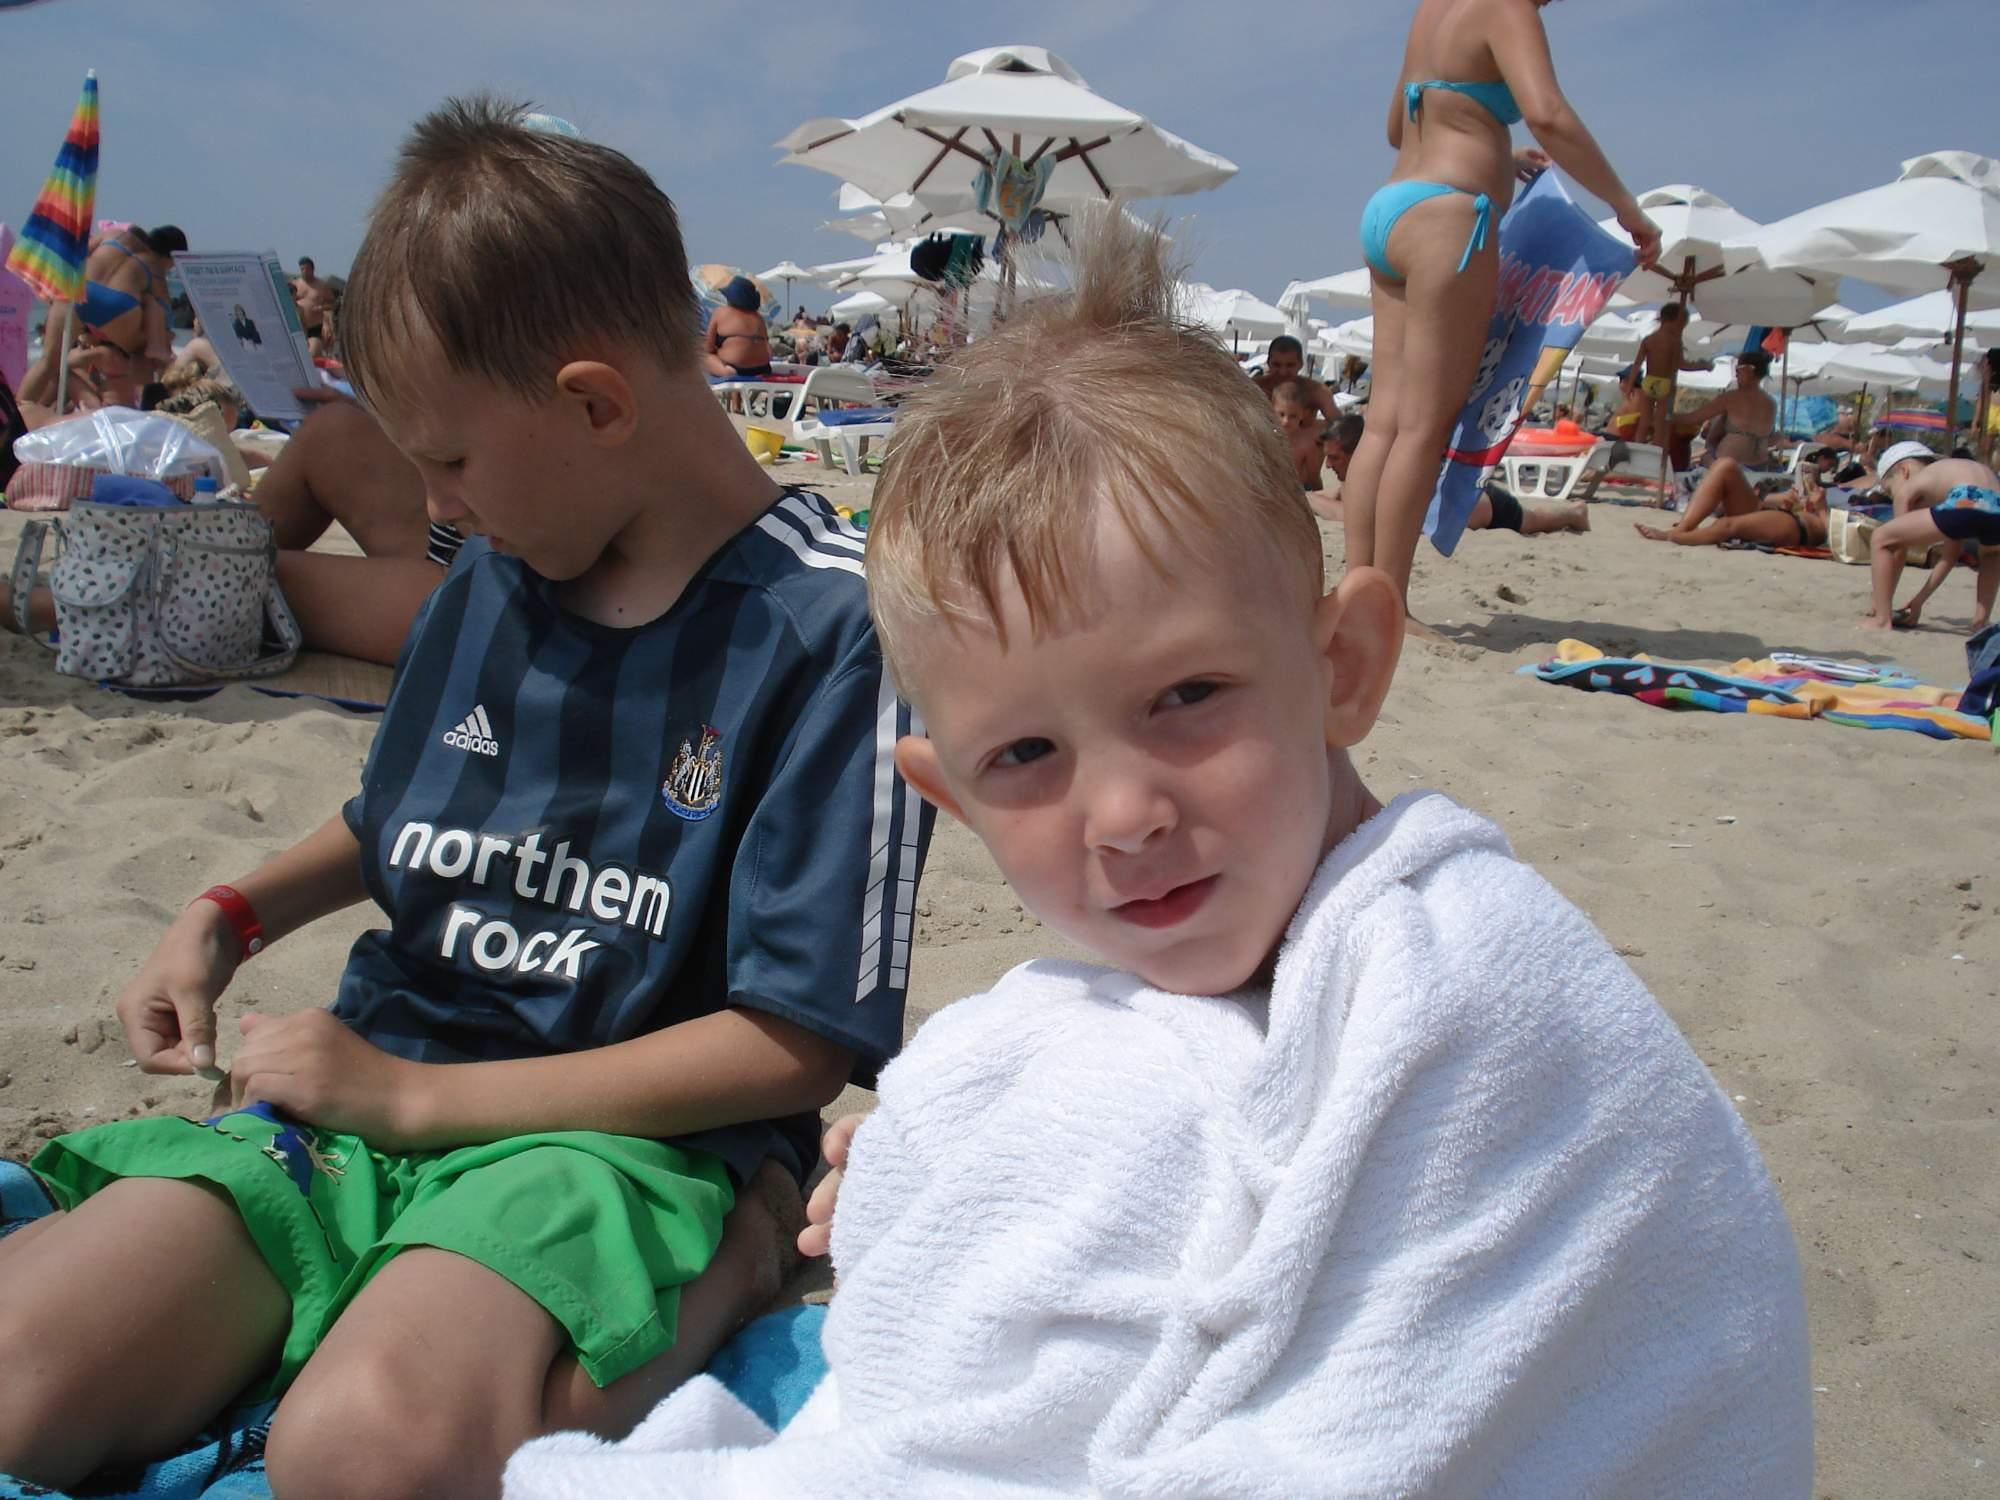 Rajce Idnes Beach Bing images